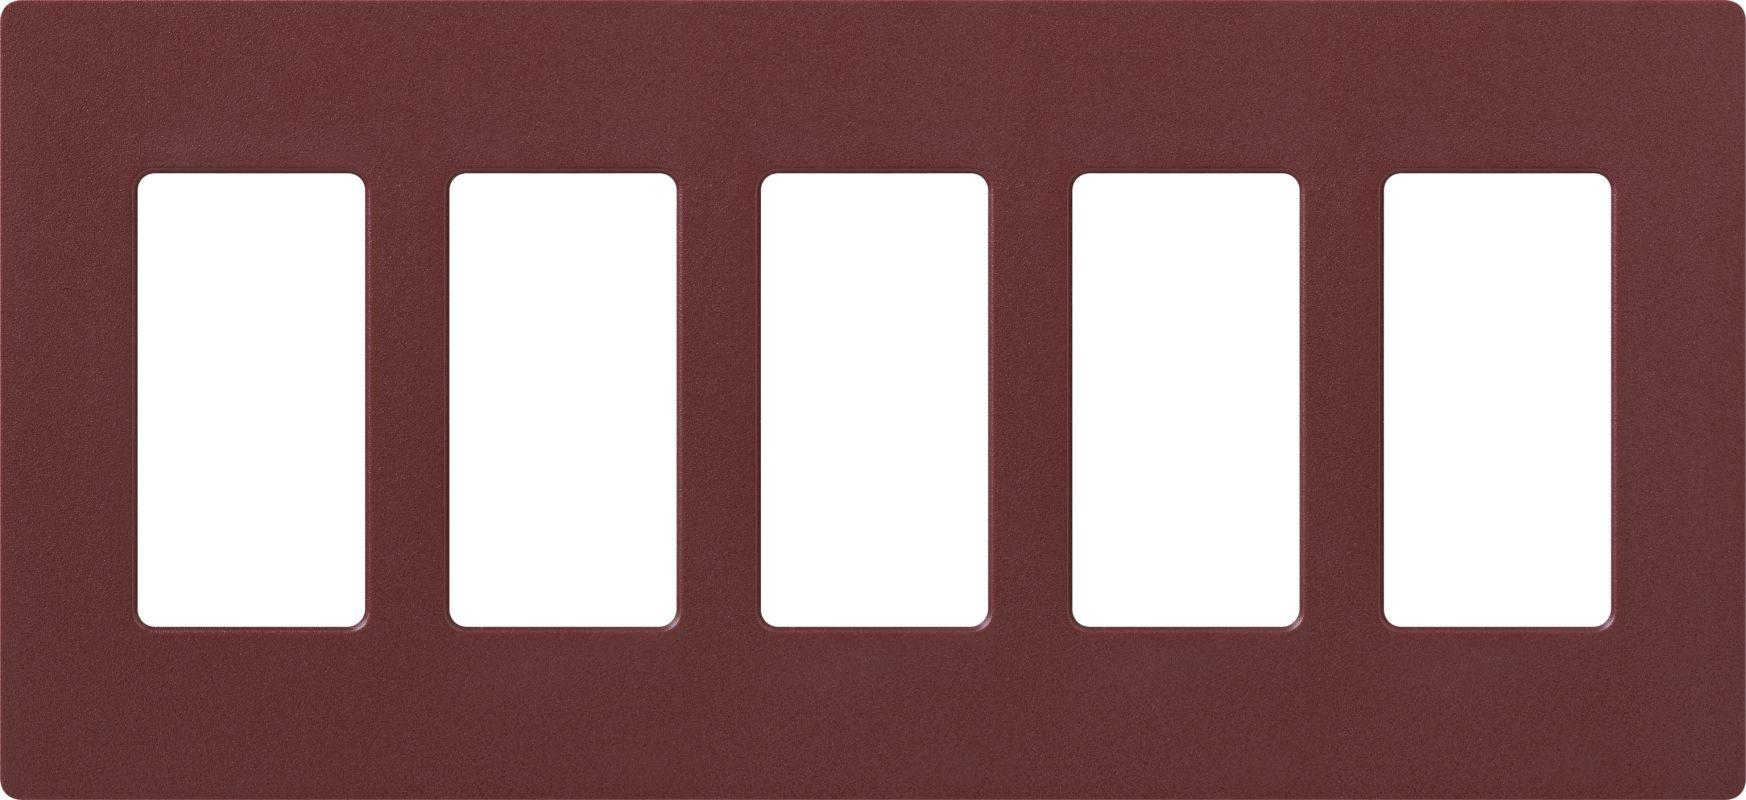 Lutron CW-5 Claro Five Gang Designer Wall Plate Merlot Wall Controls